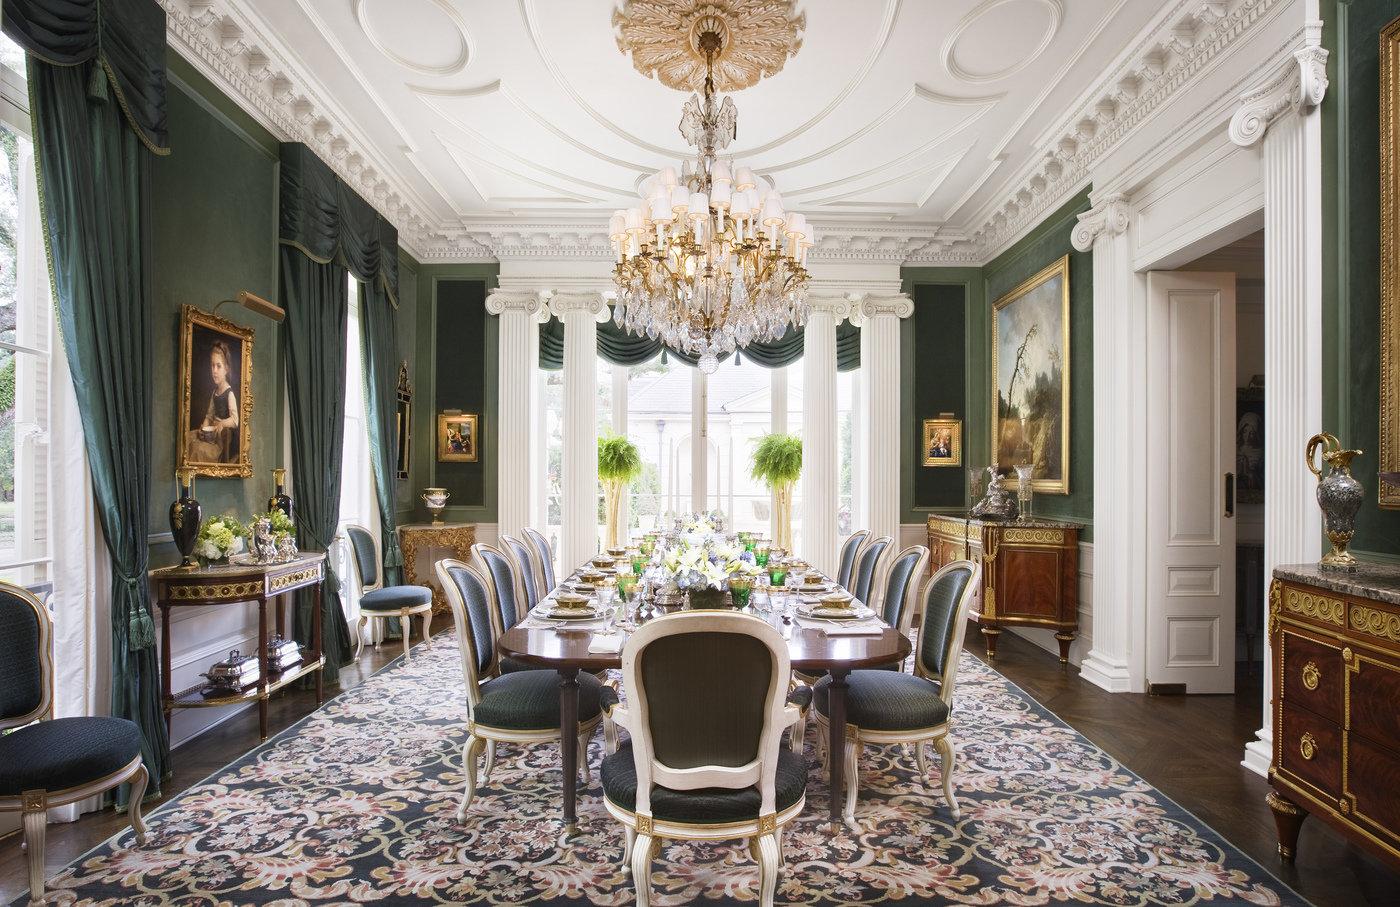 Top NYC interior designer Alexa Hampton